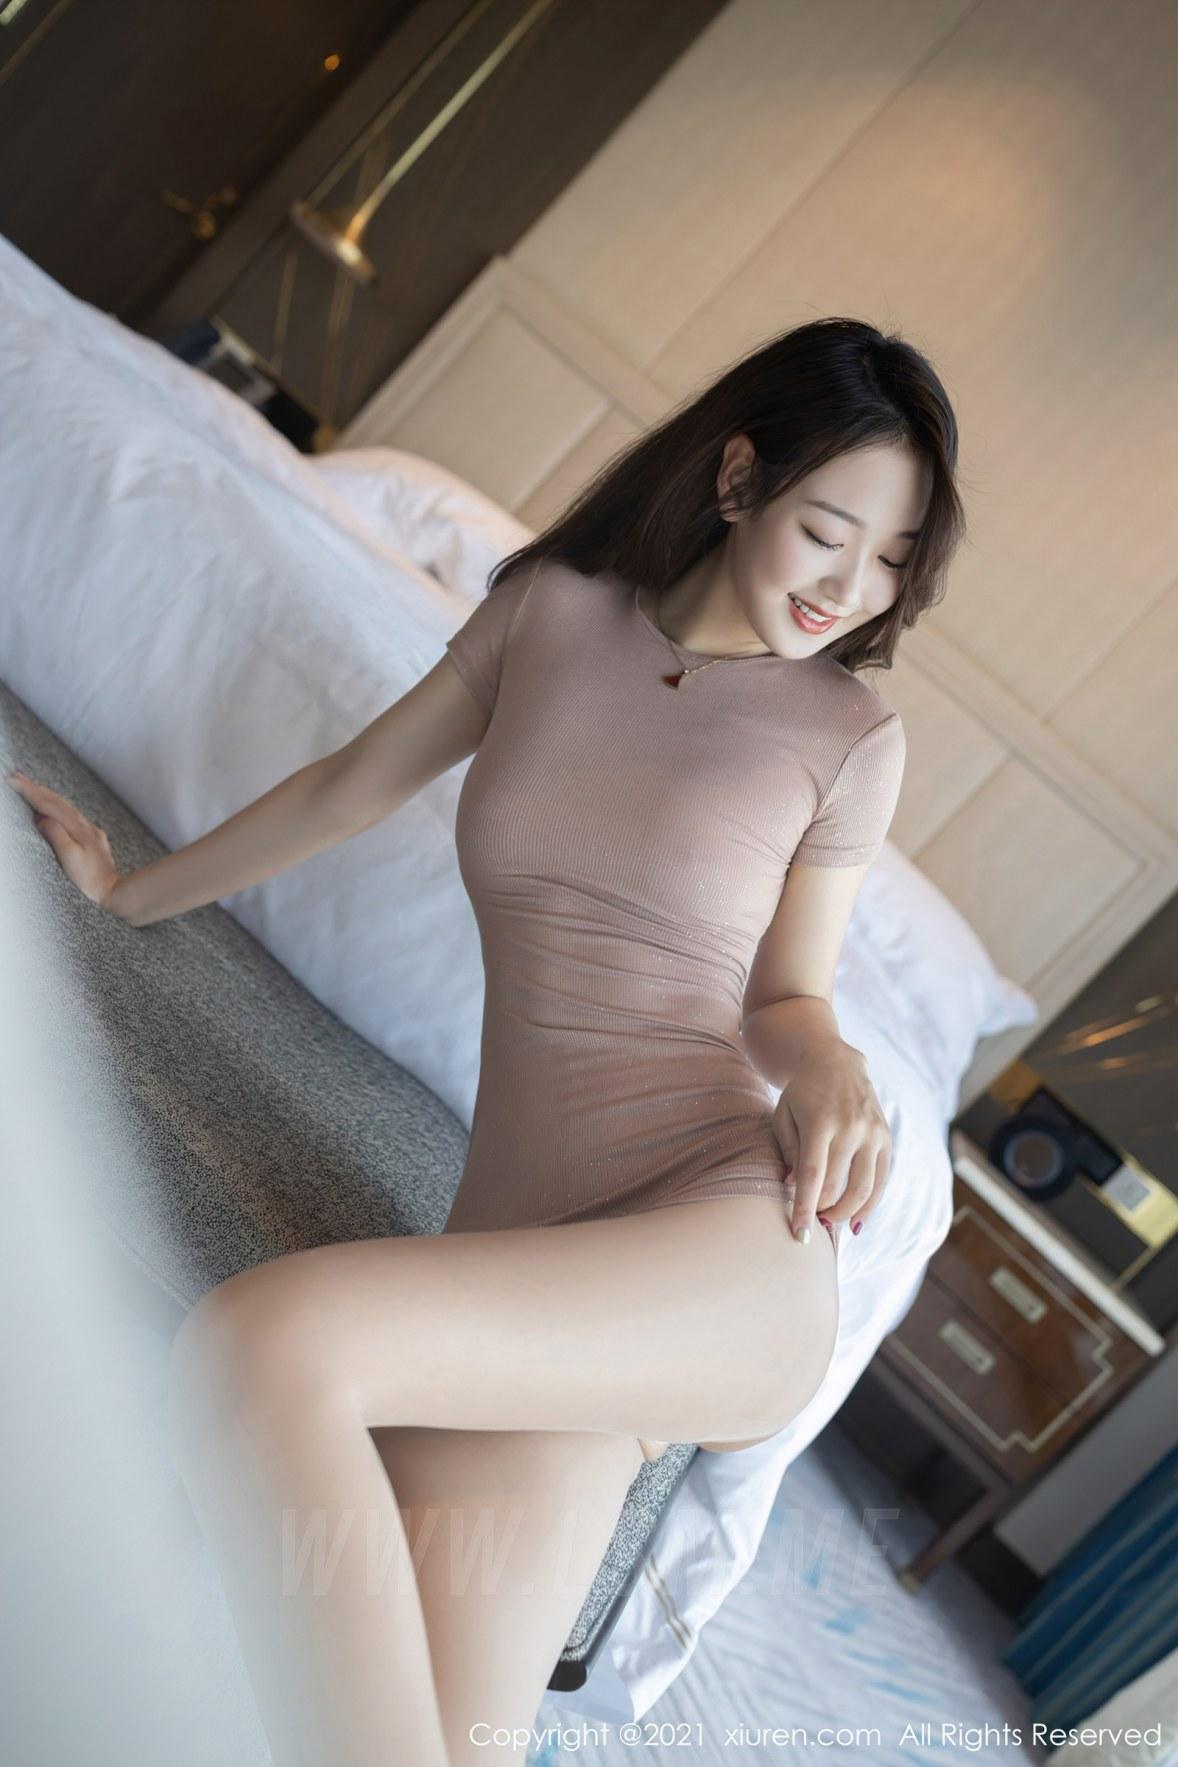 3780 028 kq5 3600 5400 - XiuRen 秀人 No.3780 裸色裙主题系列 唐安琪 澳门旅拍写真22 - 秀人网 -【免费在线写真】【丽人丝语】